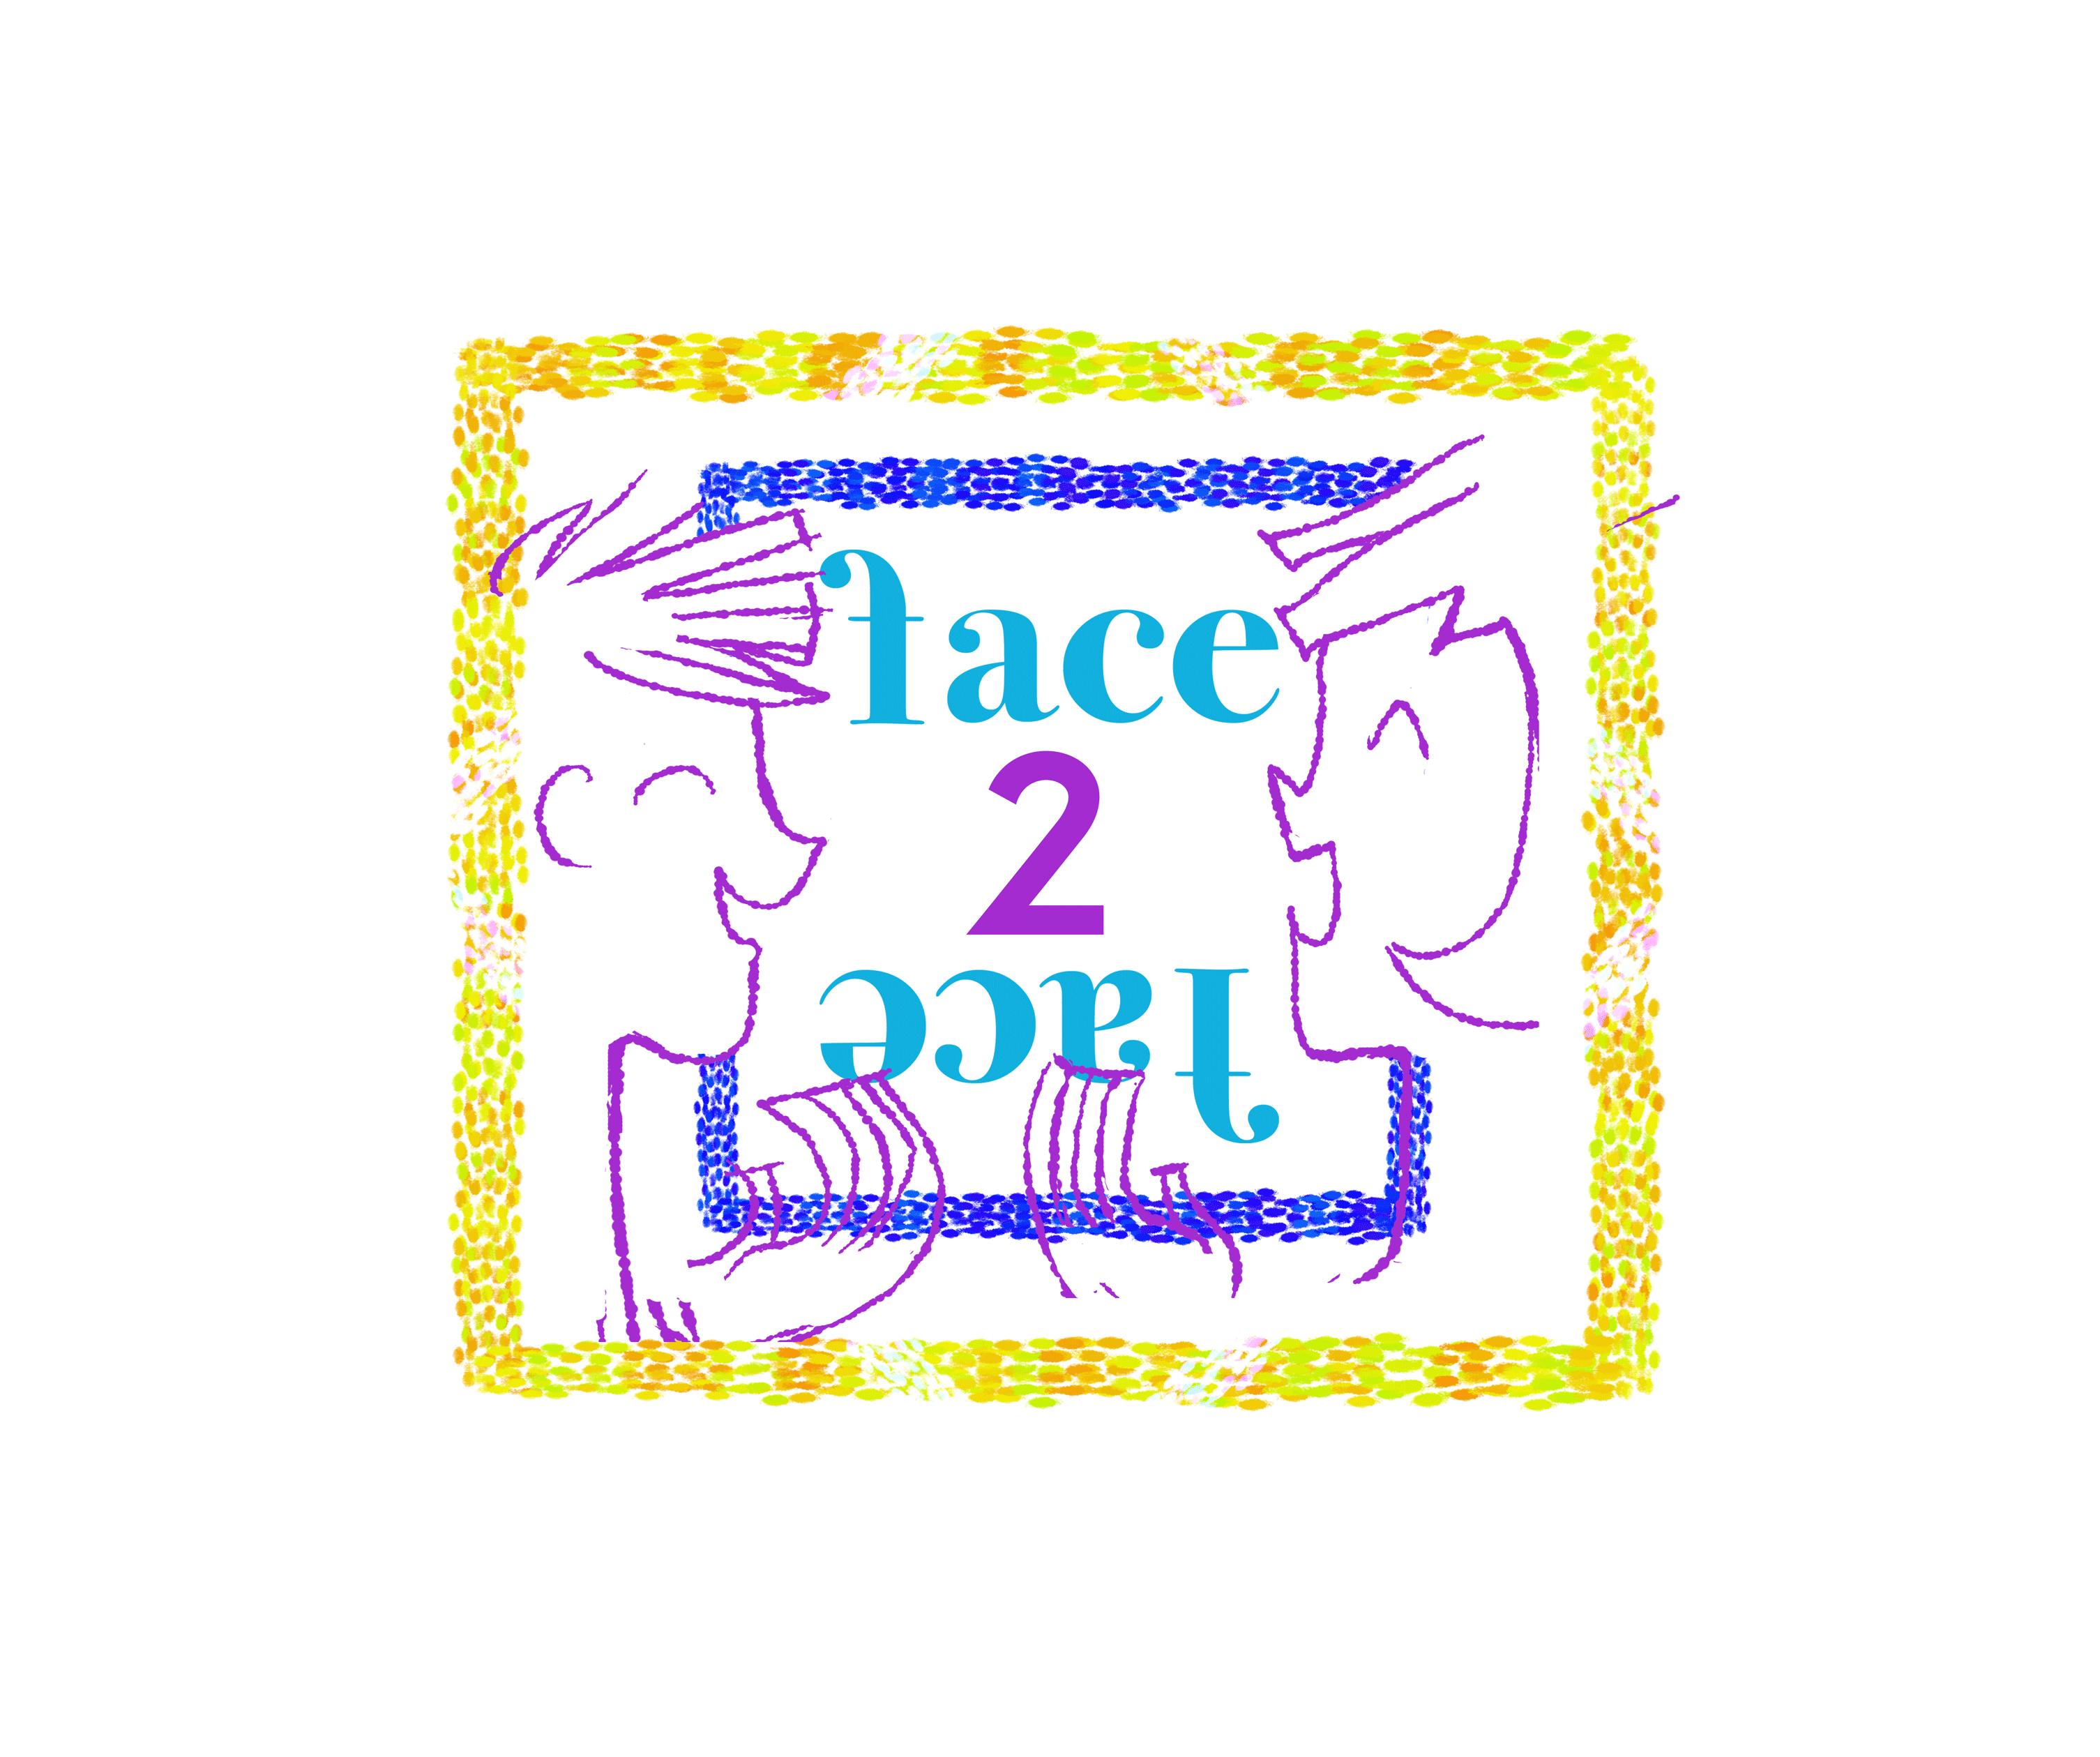 face 2 happy hour illustration graphic design flyer art kunst kunsthal AYCA all you can art groene hilledijk summer camp Rotterdam holland netherlands dutch europa aumen green grafisch ontwerp Au+Men Studios